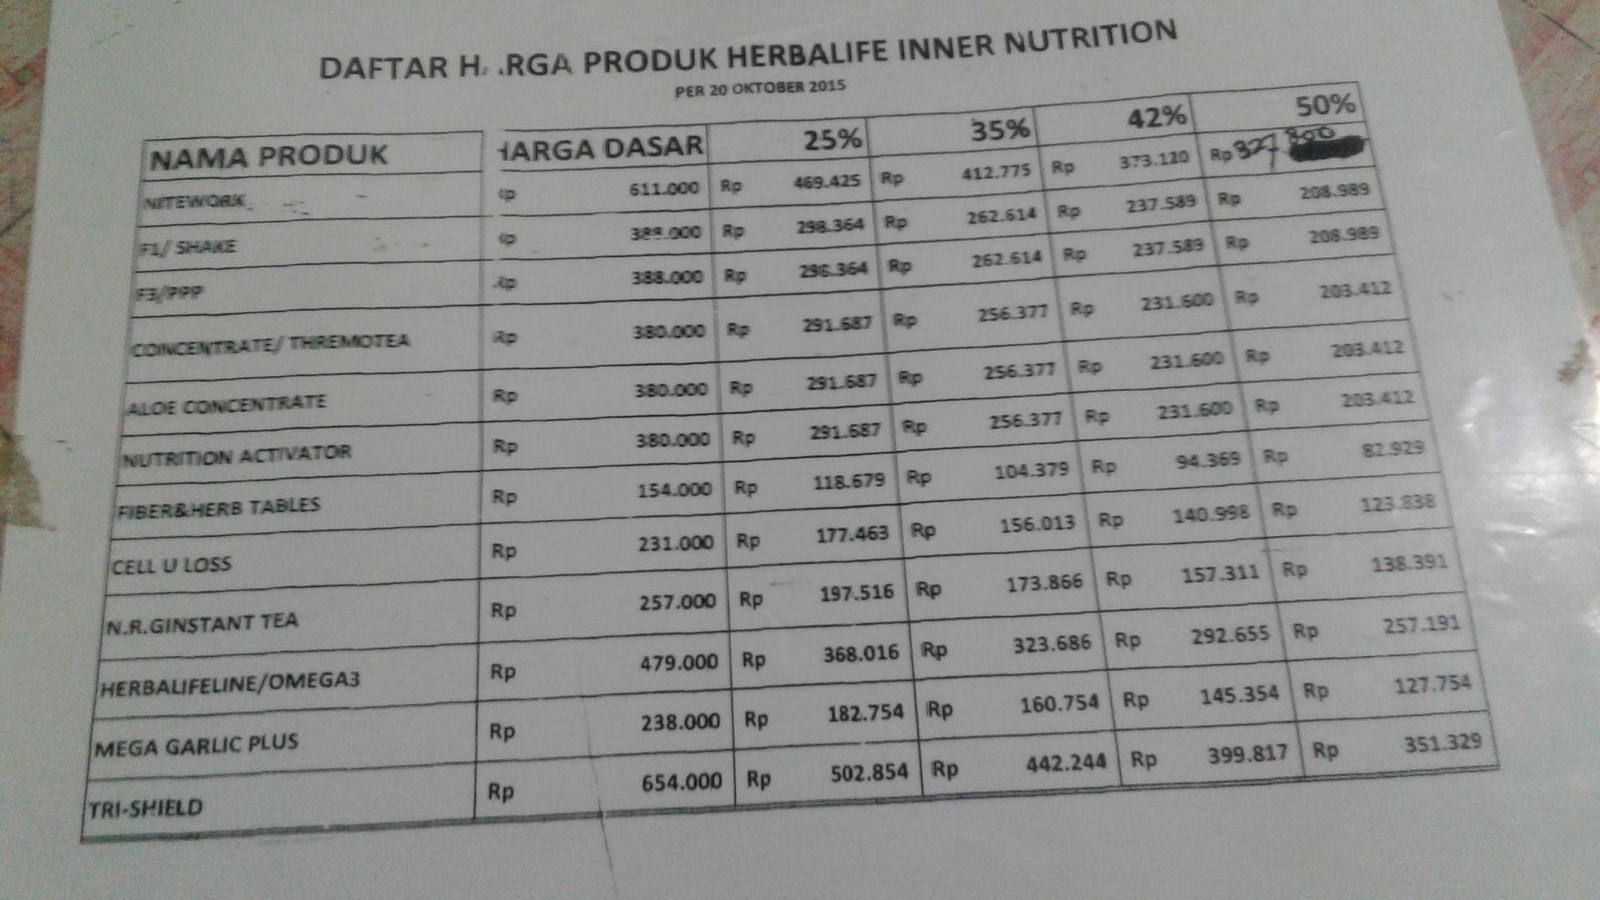 Harga Herbalife F1 Nutritional Shake Mix - Nutrition Ftempo